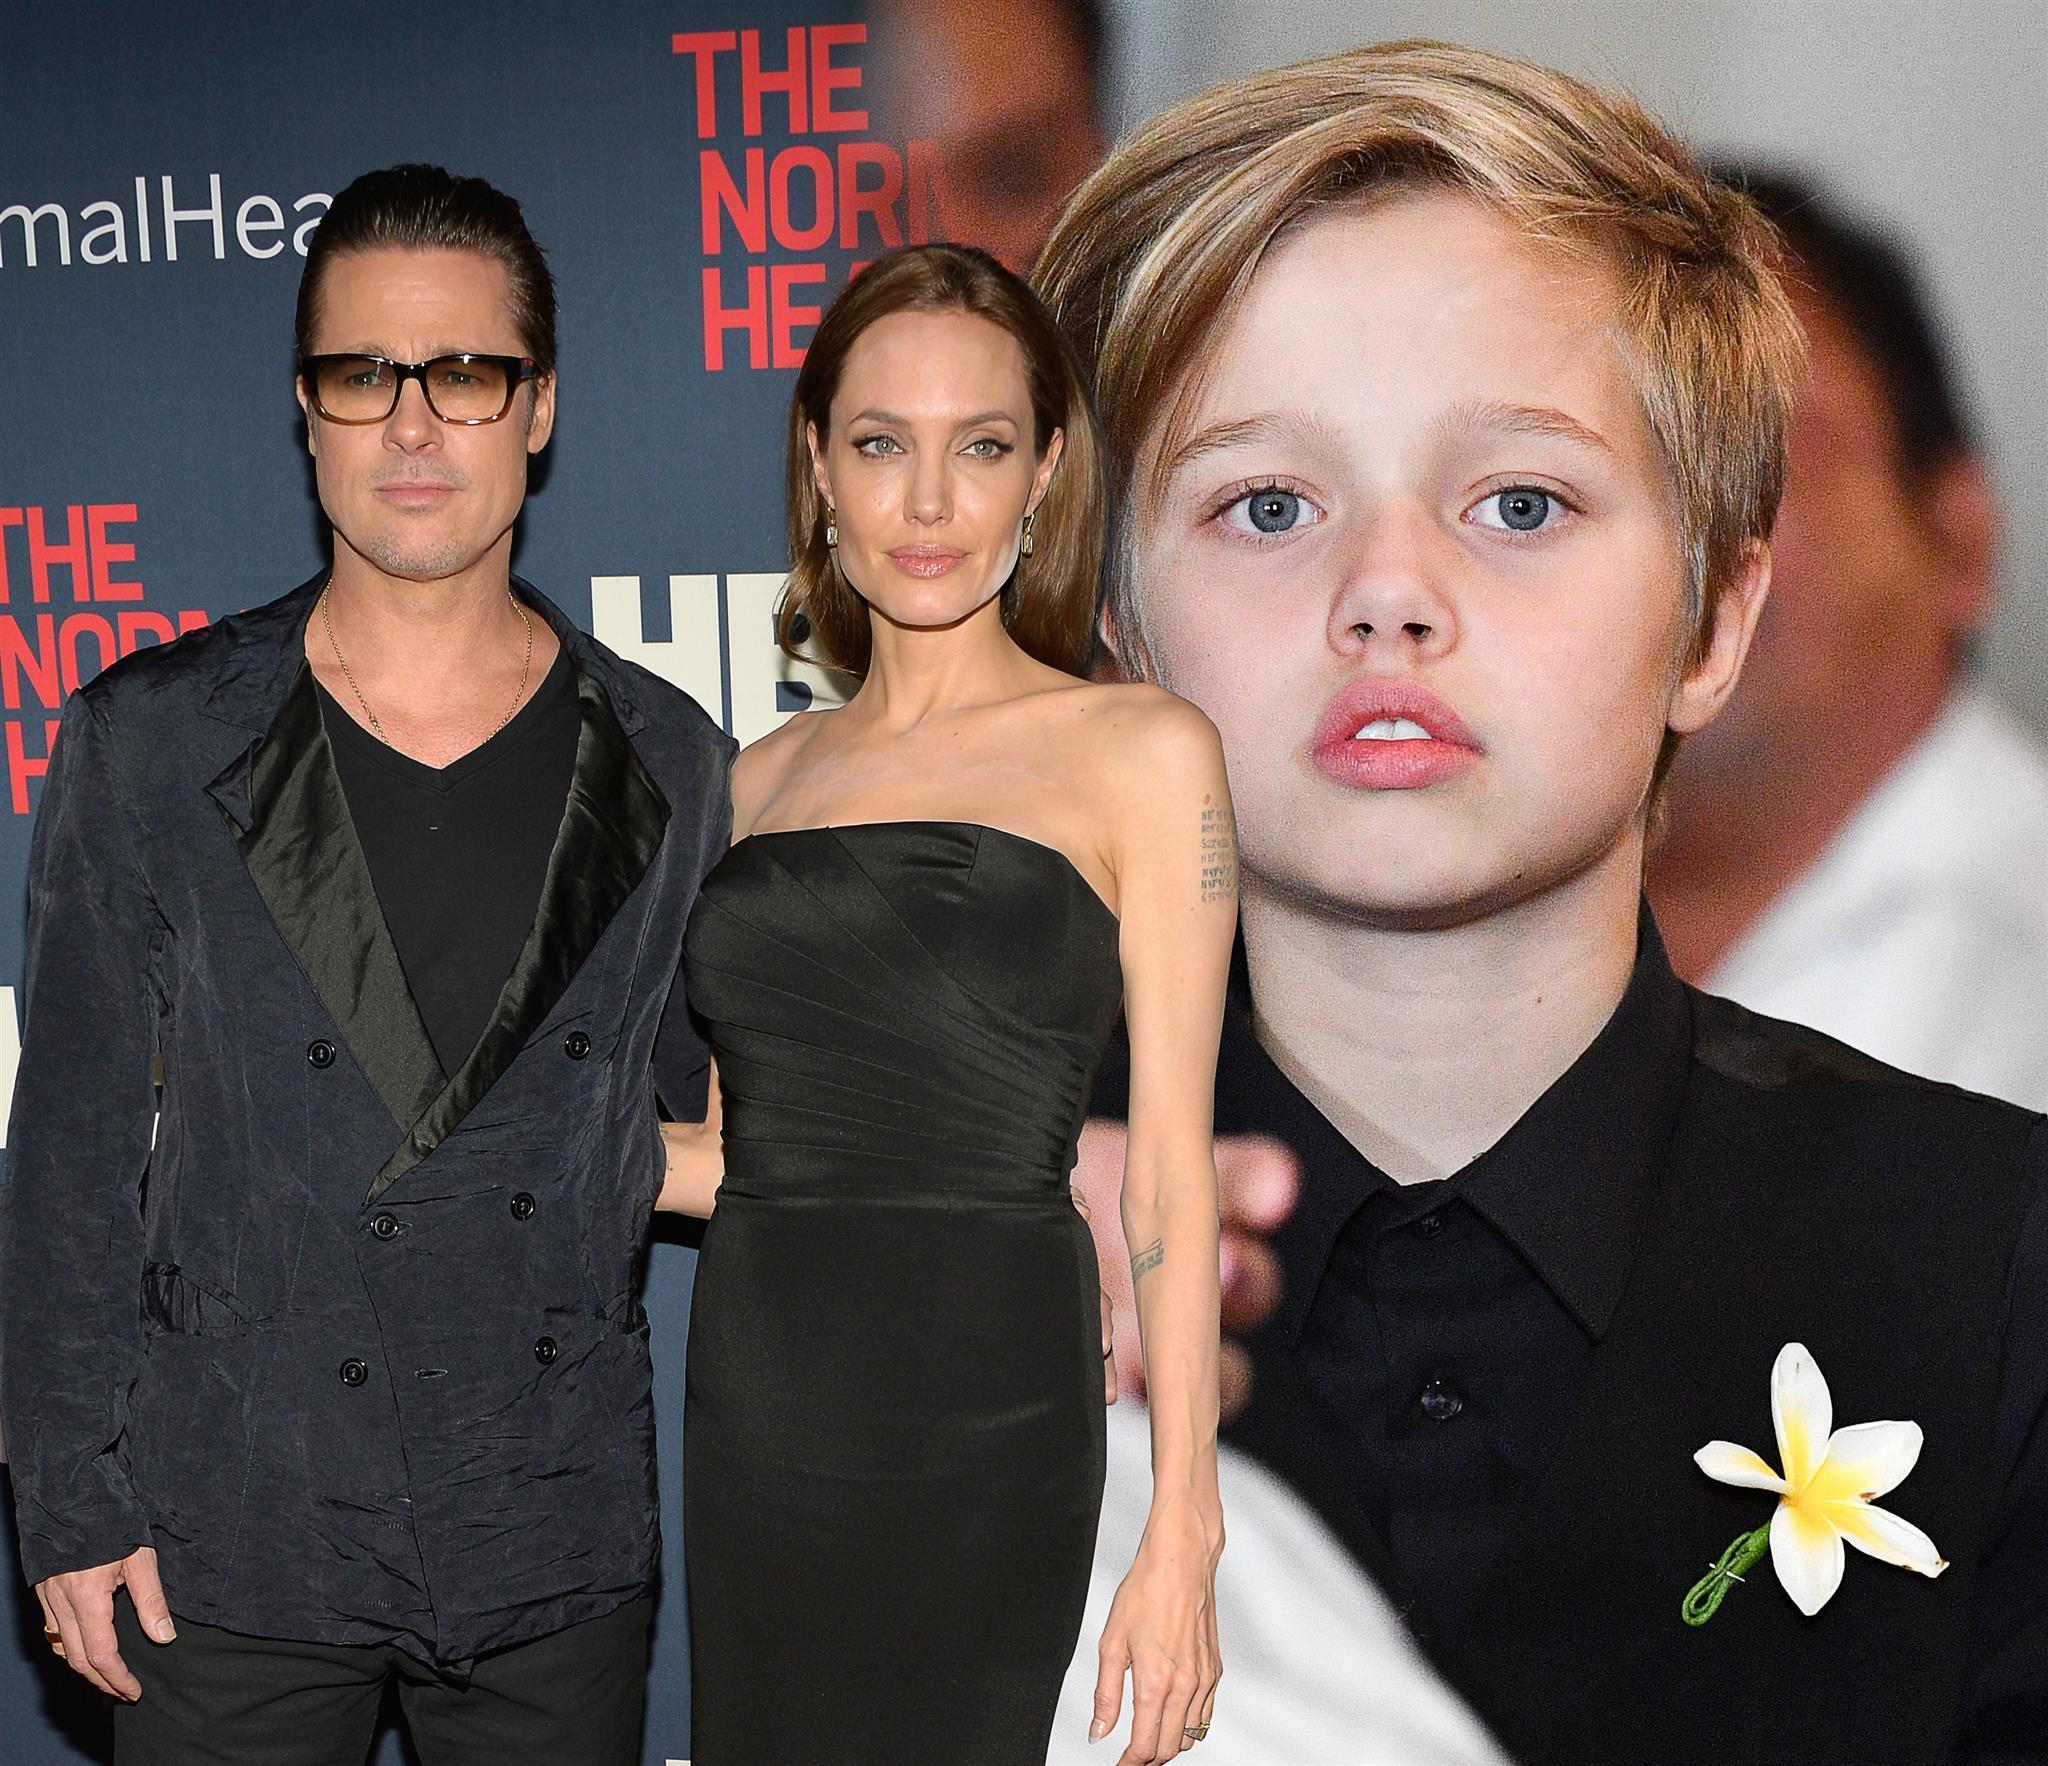 Brad Pitt, Angelina Jolie, Shiloh Jolie-Pitt